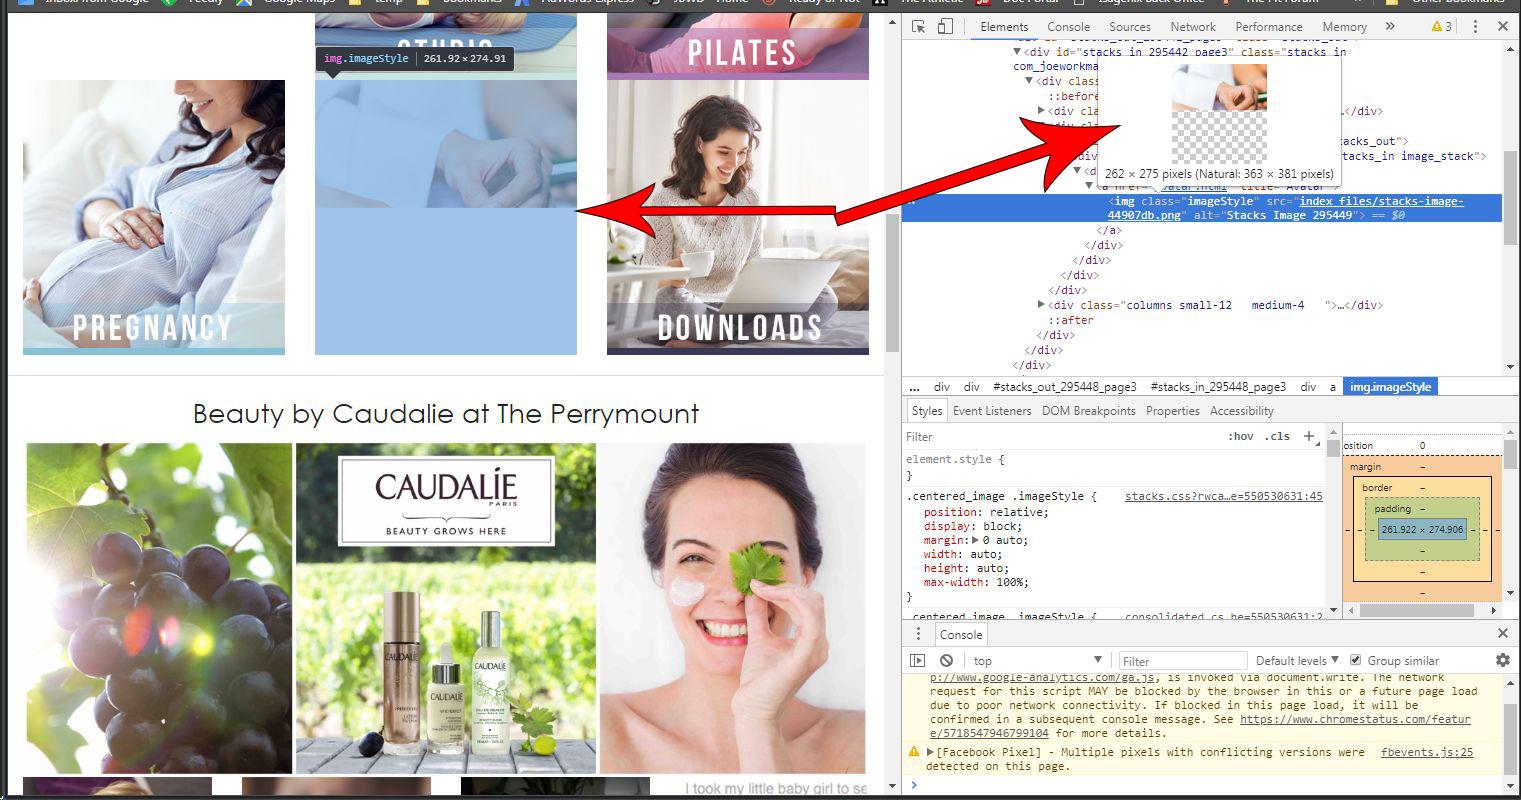 Images not uploading fully - RapidWeaver - RapidWeaver Forums